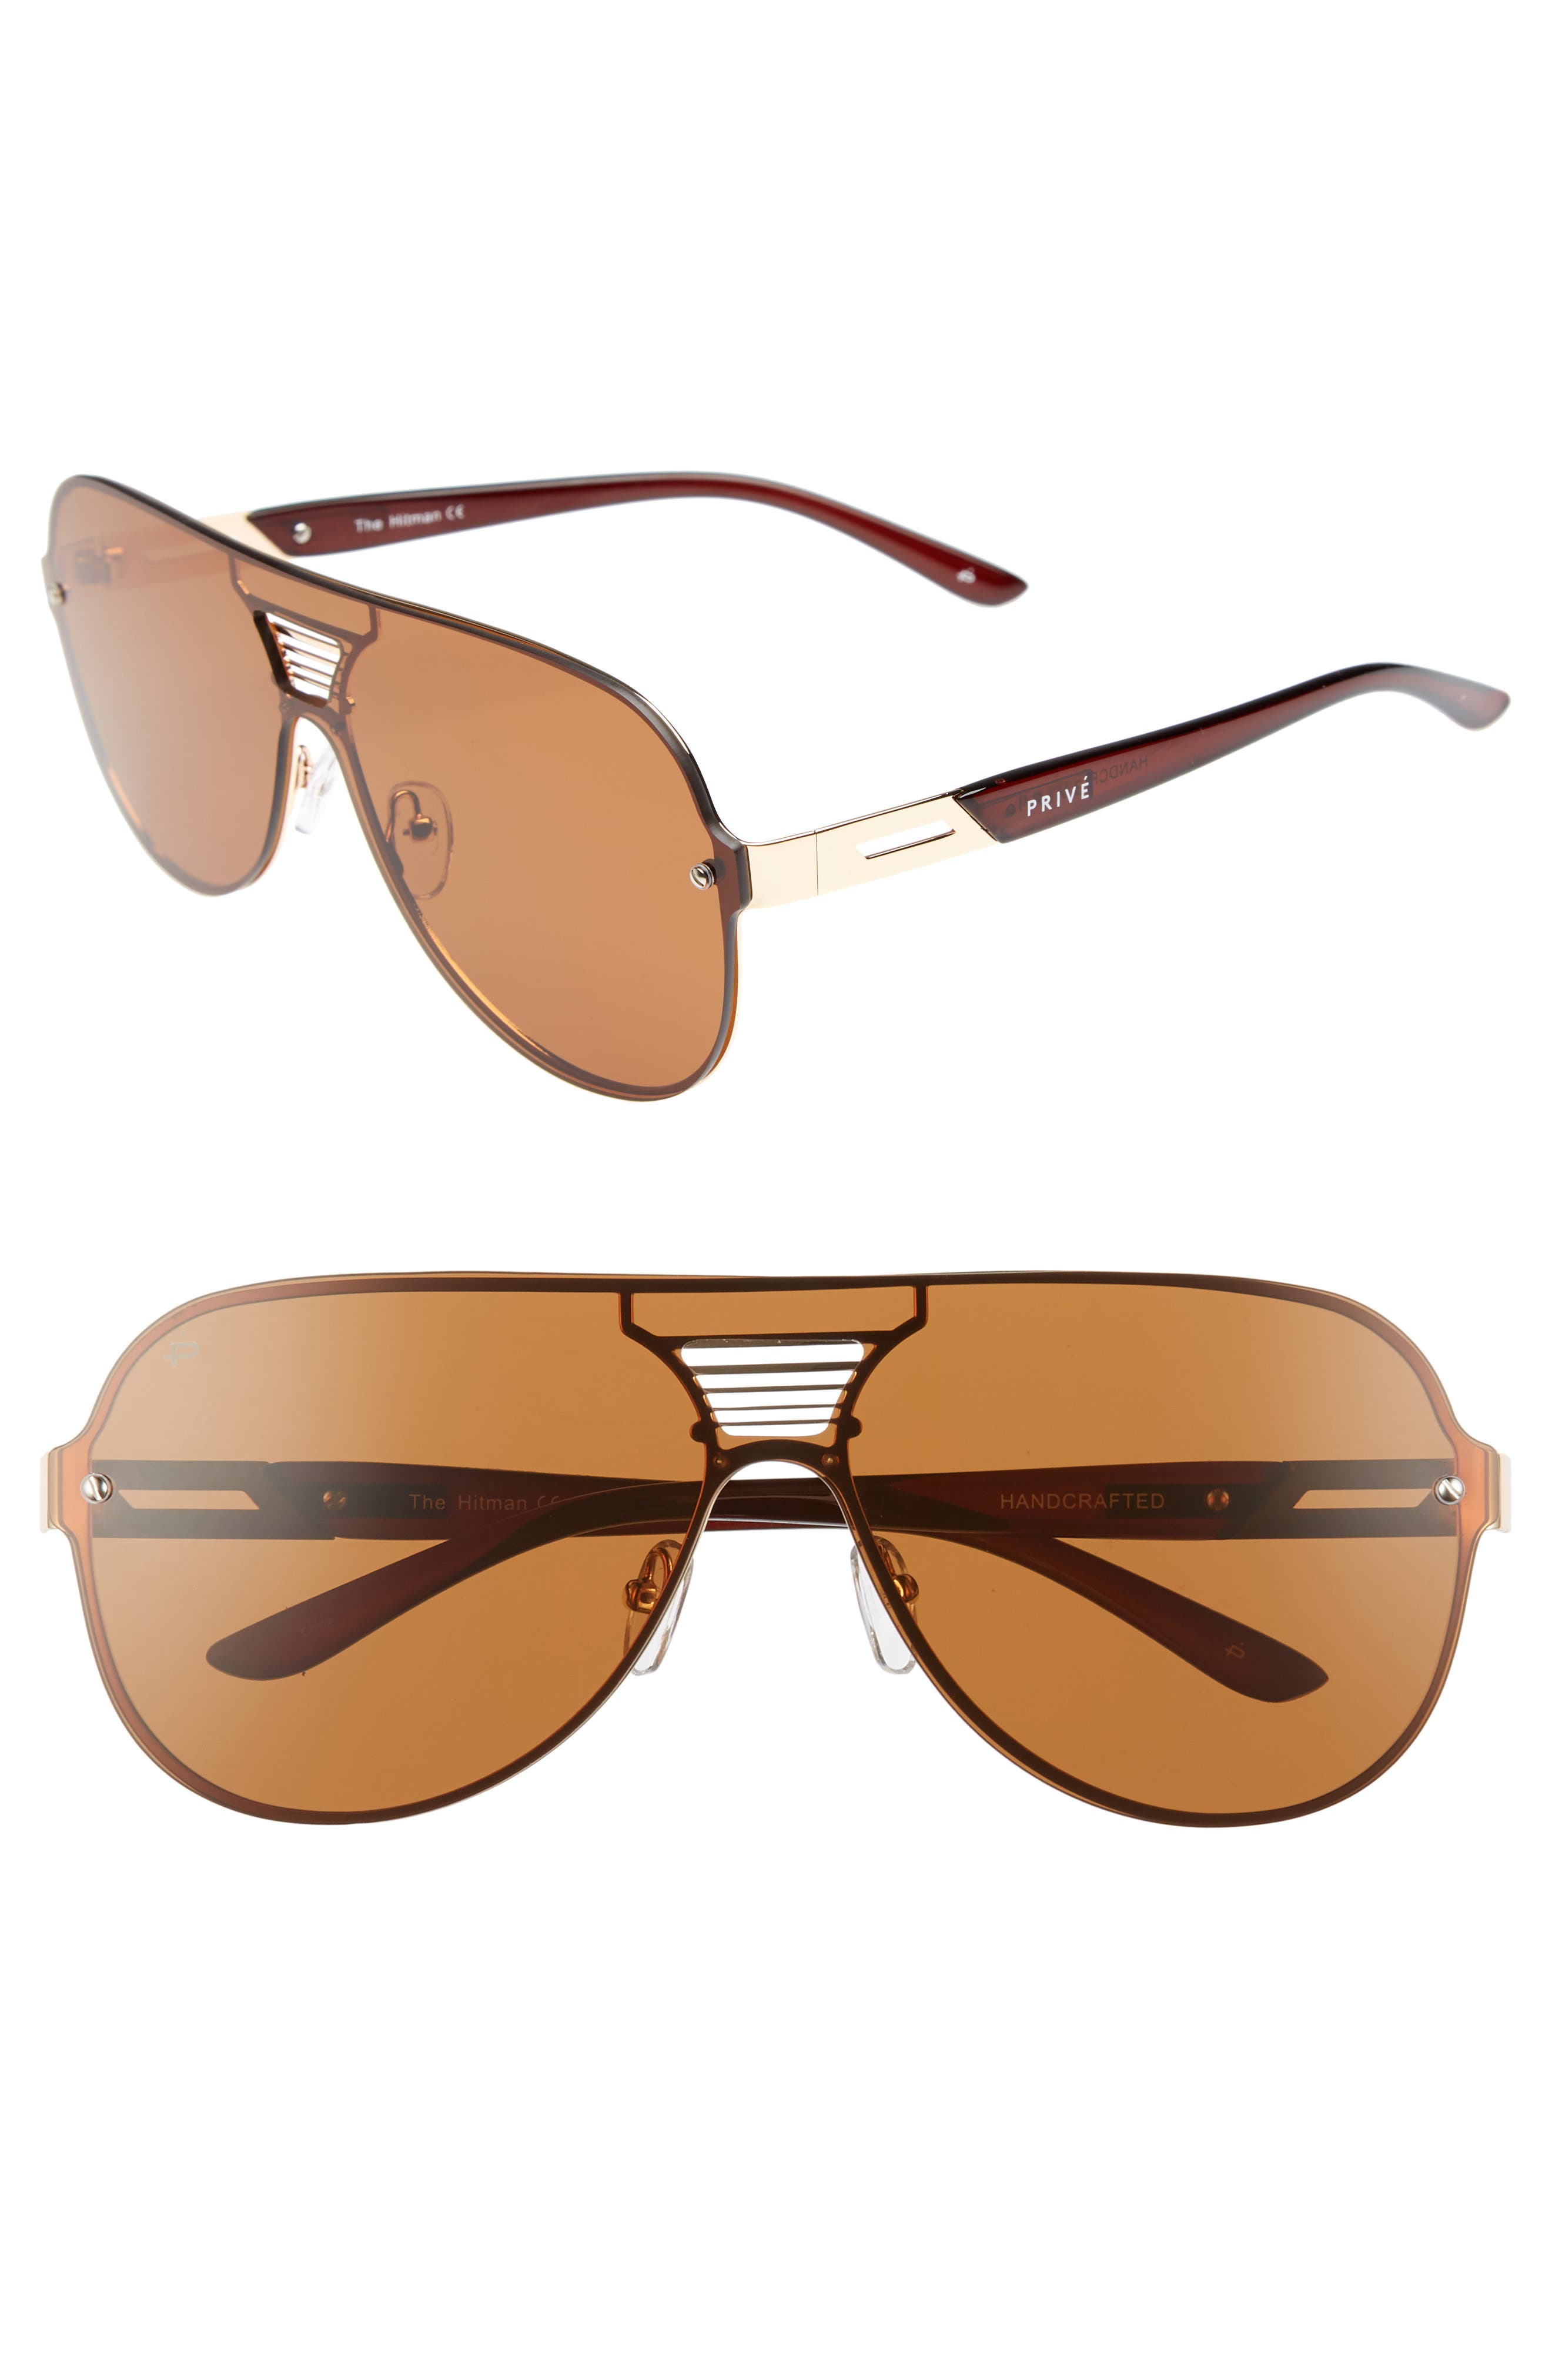 Privé Revaux The Hitman 63mm Polarized Oversize Aviator Sunglasses,                             Main thumbnail 1, color,                             Brown